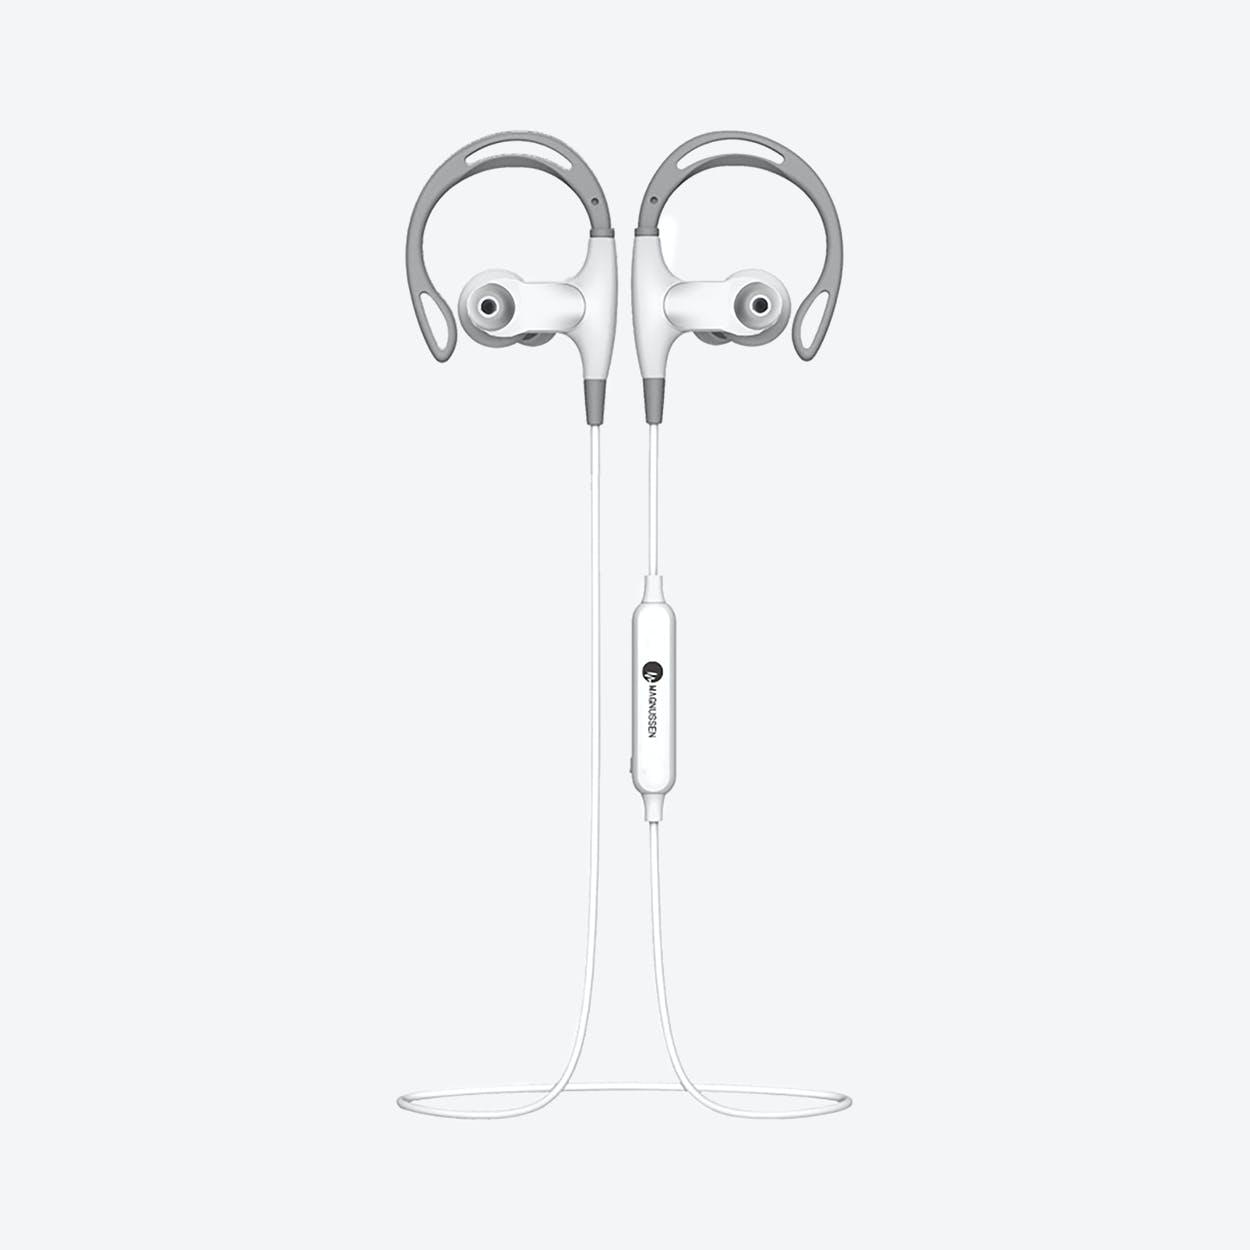 MAGNUSSEN M8 Bluetooth Wireless Earphones in White